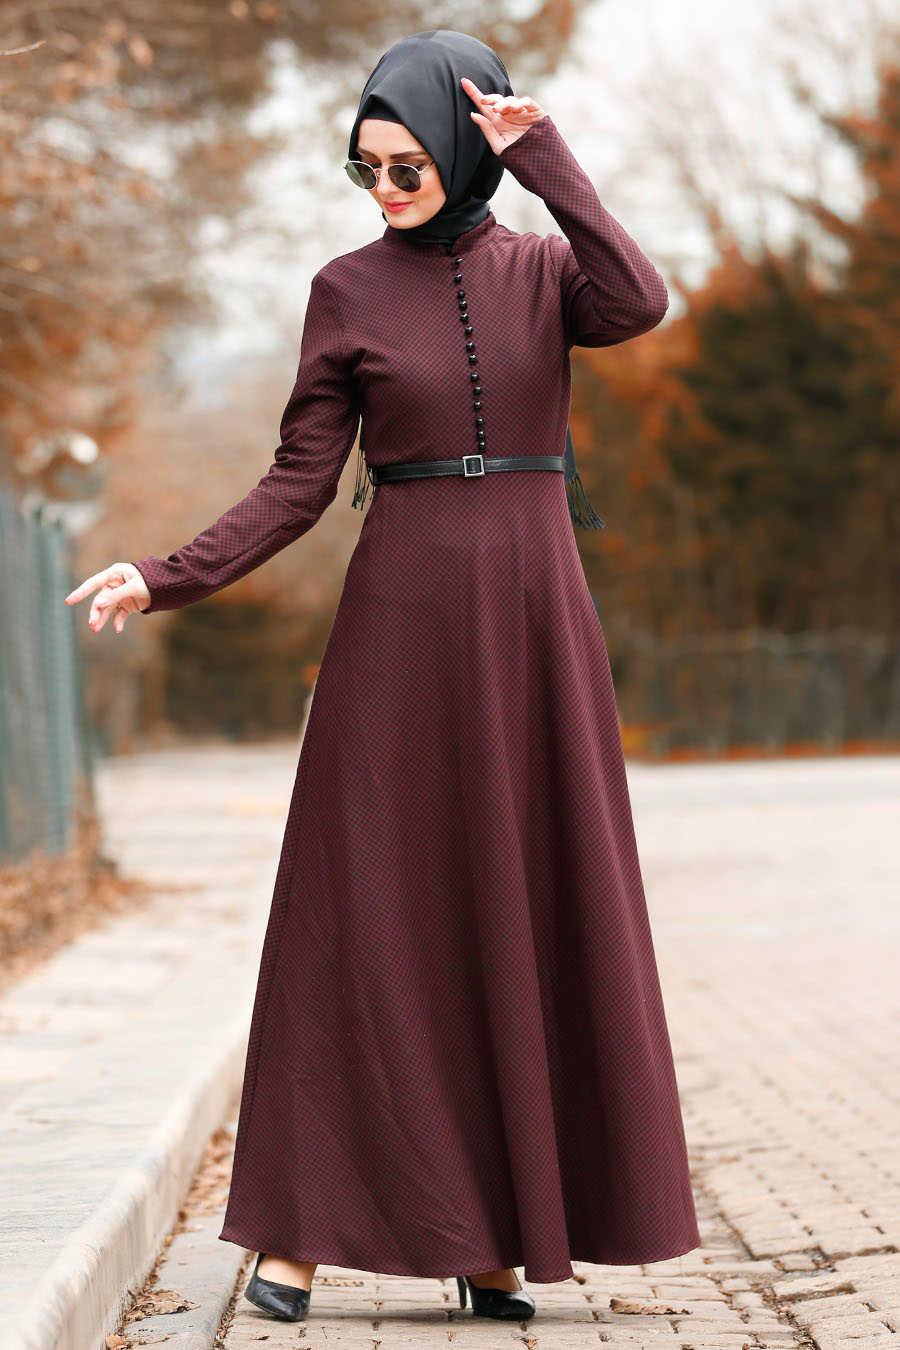 Neva Style - Claret Red Hijab Dress 8440BR